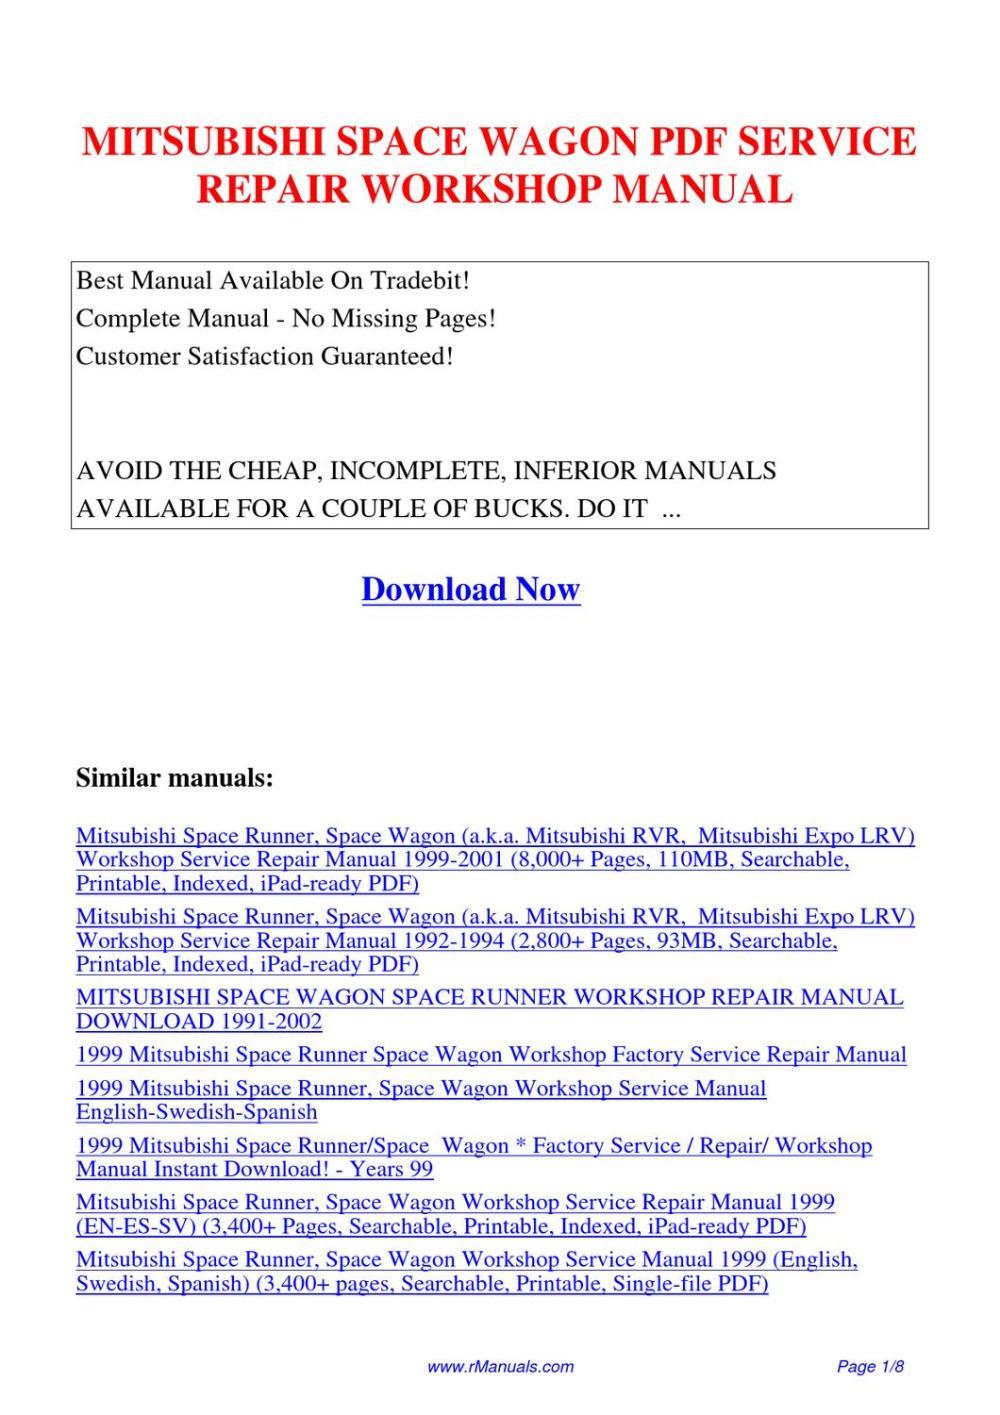 medium resolution of mitsubishi space wagon service repair workshop manual pdf